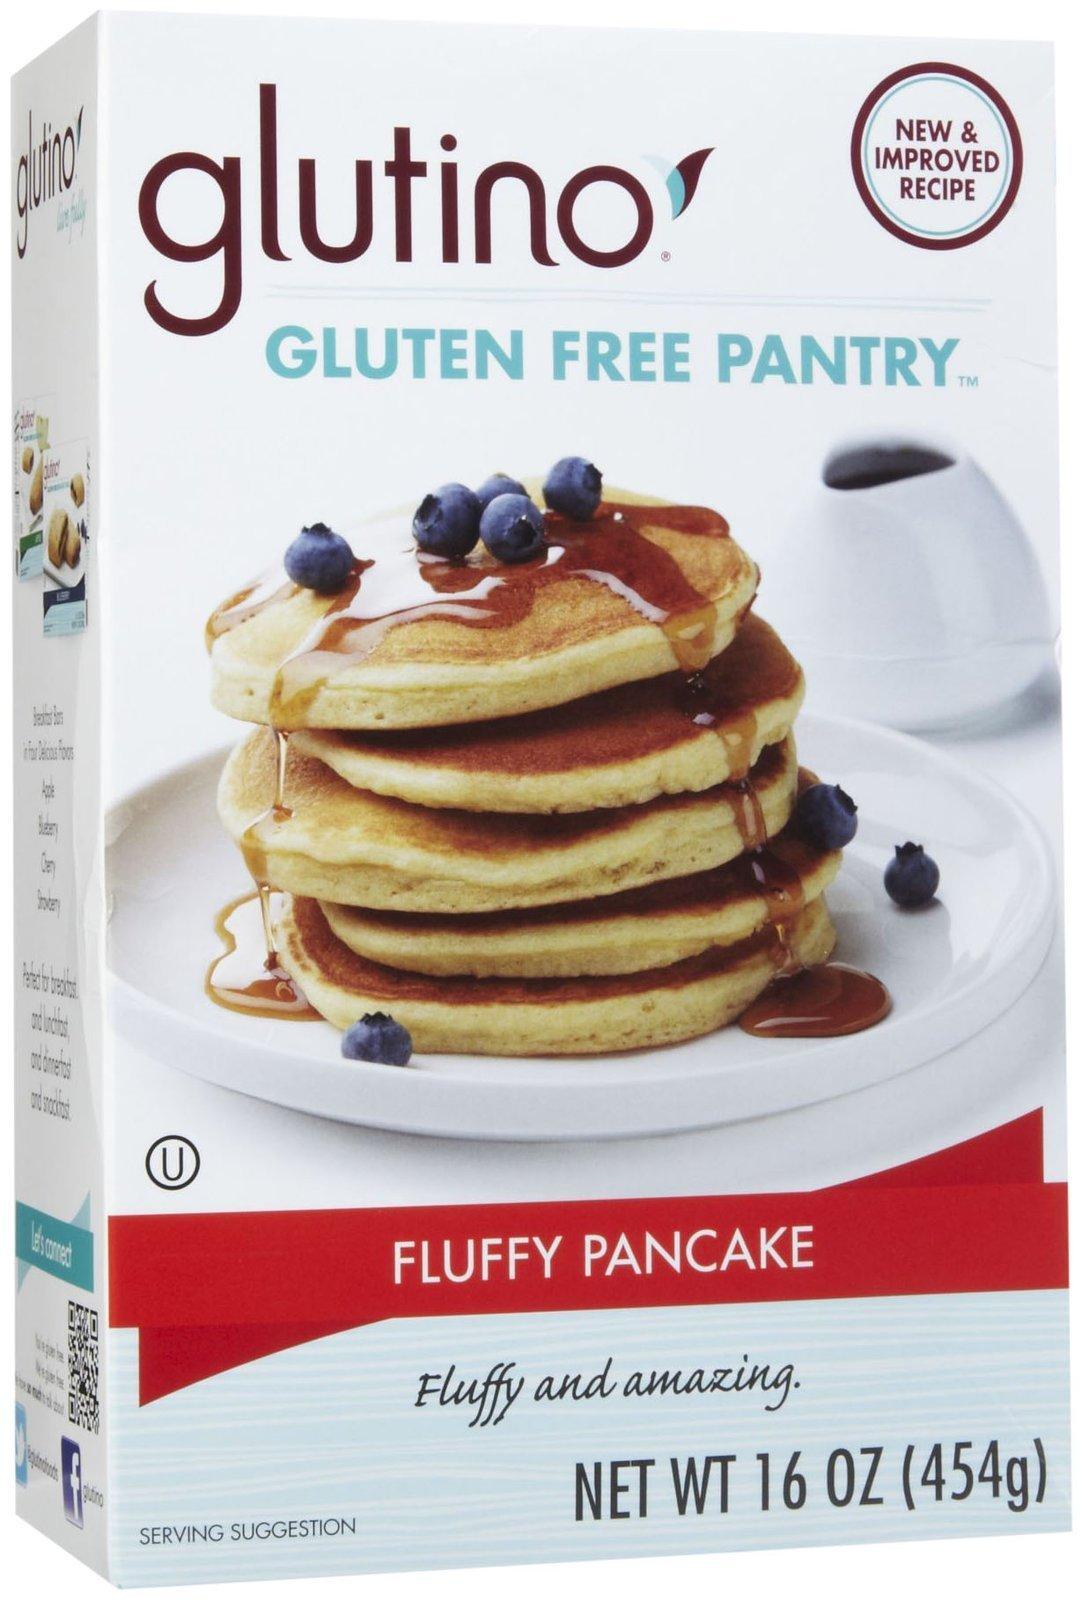 GLUTINO Brown Rice Pancake And Waffle Mix, 16 OZ